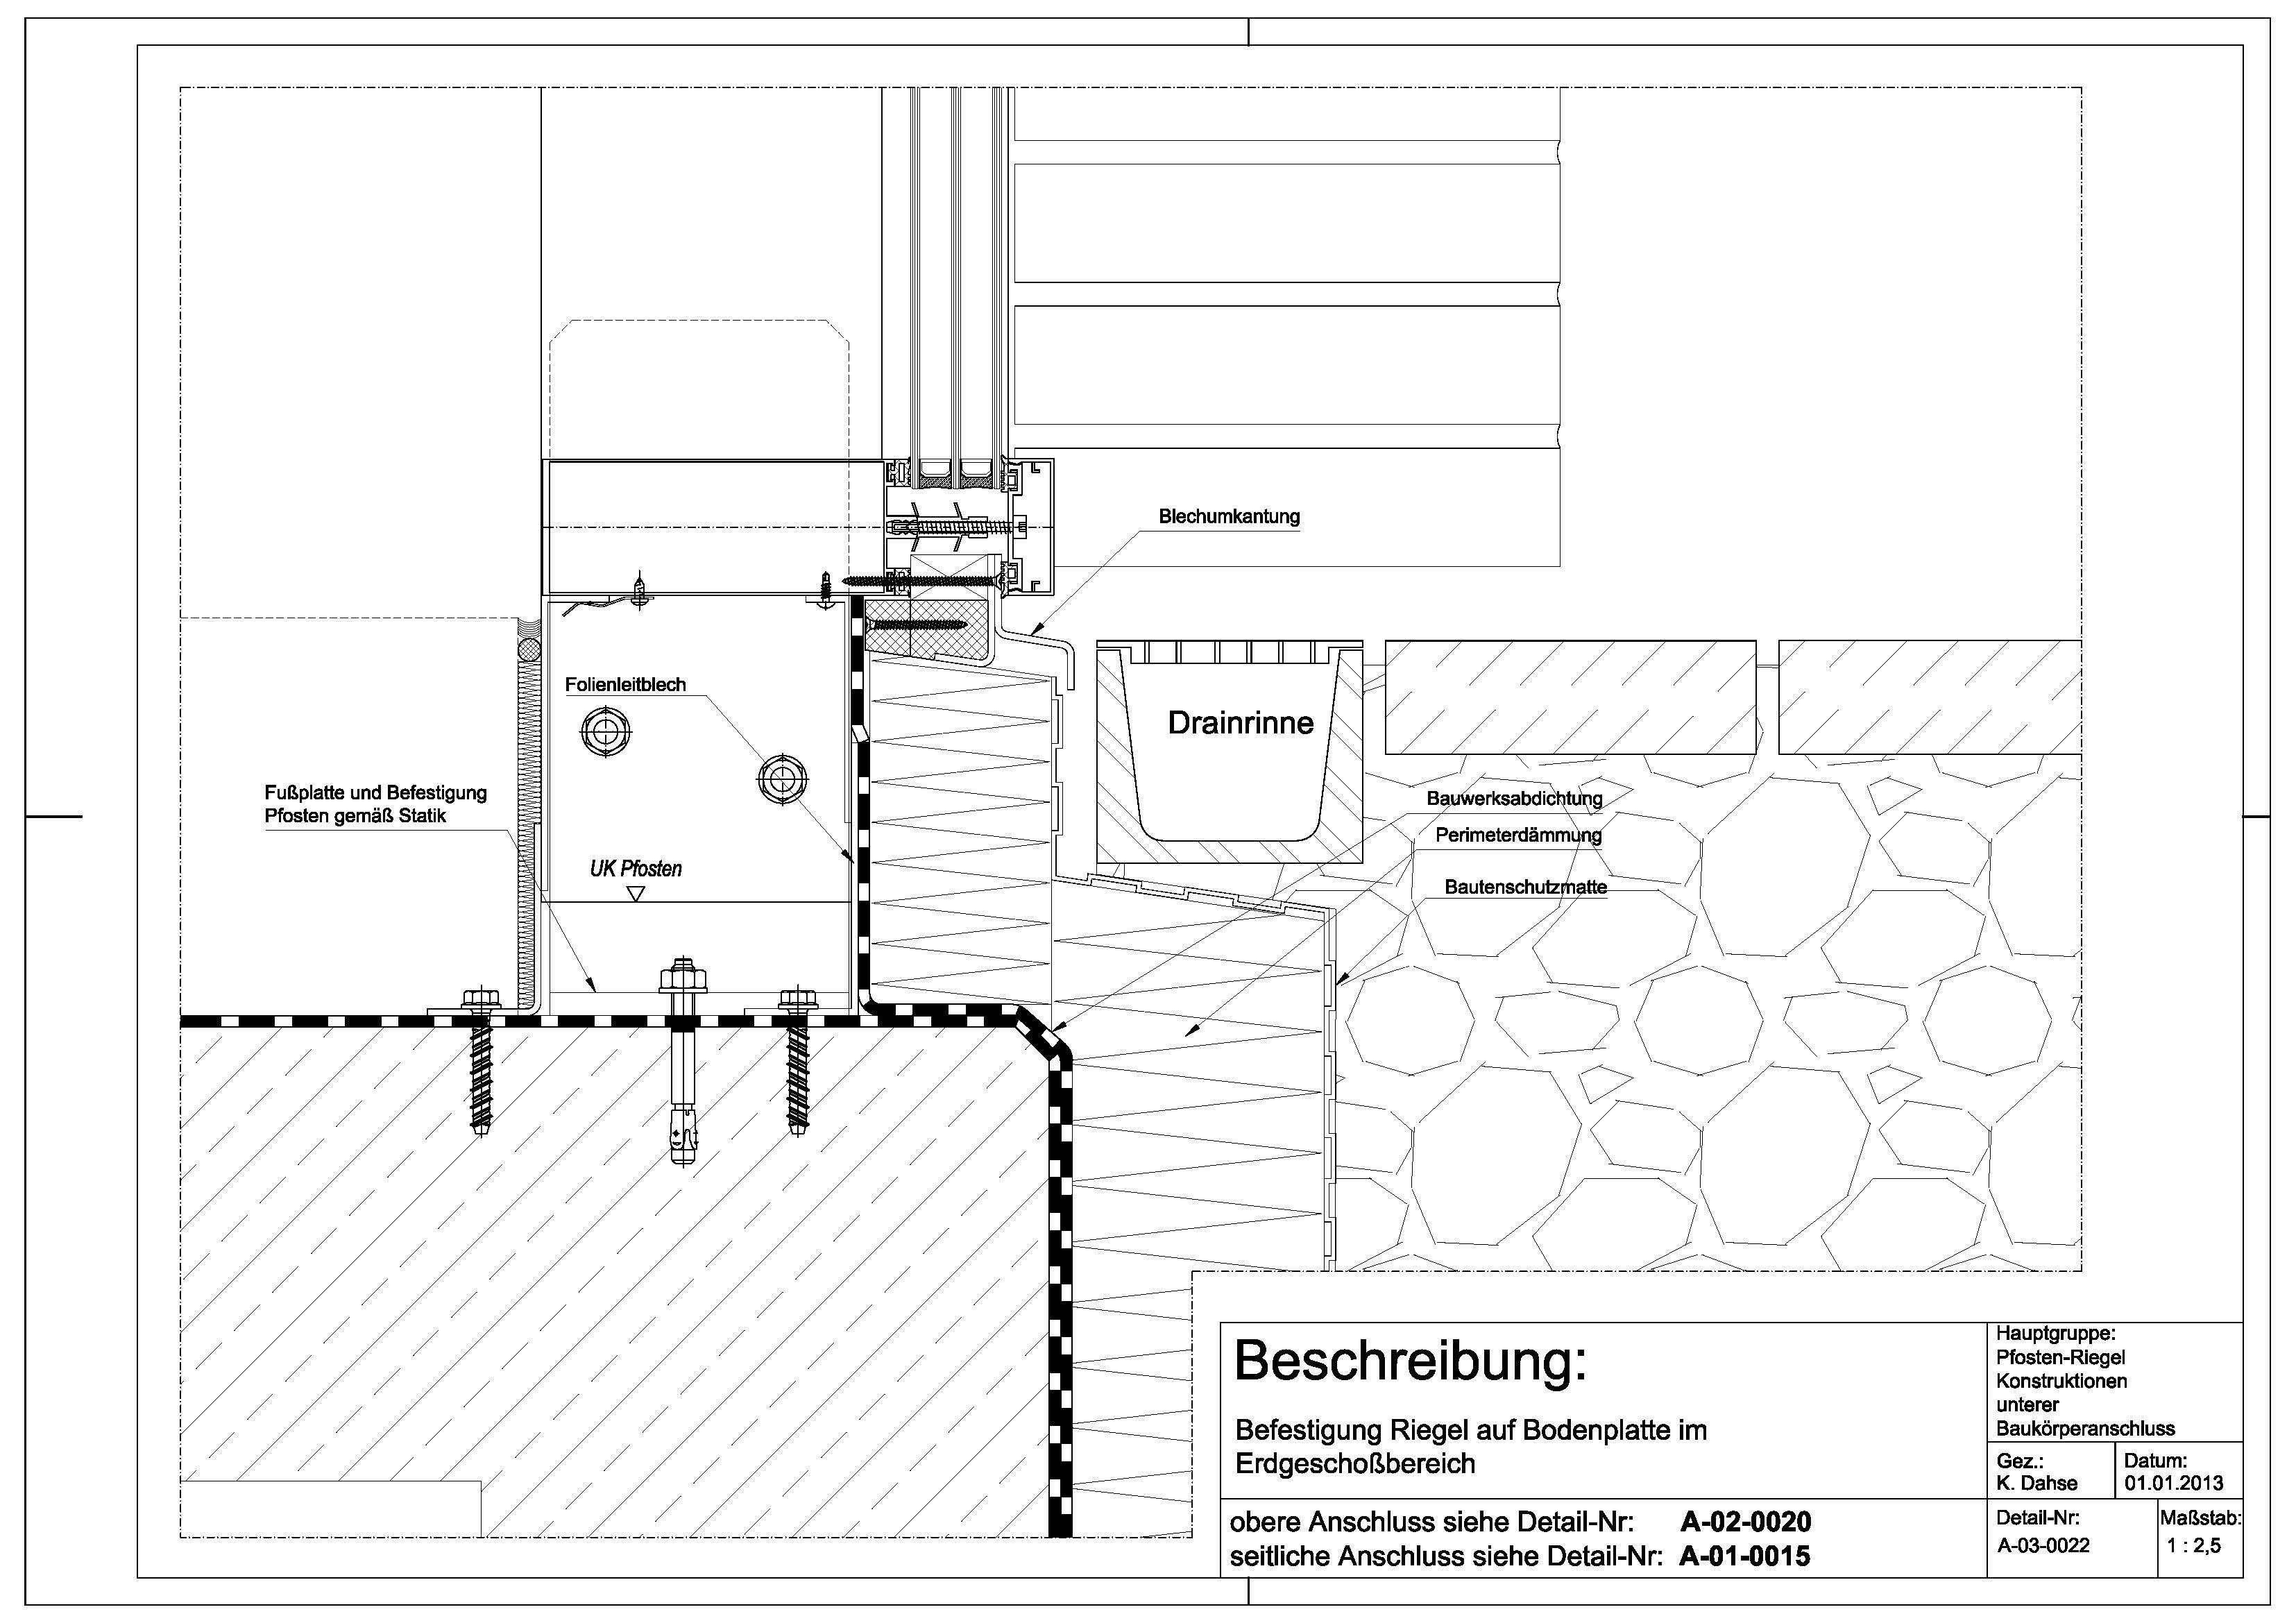 a 03 0022 befestigung riegel auf bodenplatte im erdgeschossbereich a 03 0022 konstruktion. Black Bedroom Furniture Sets. Home Design Ideas